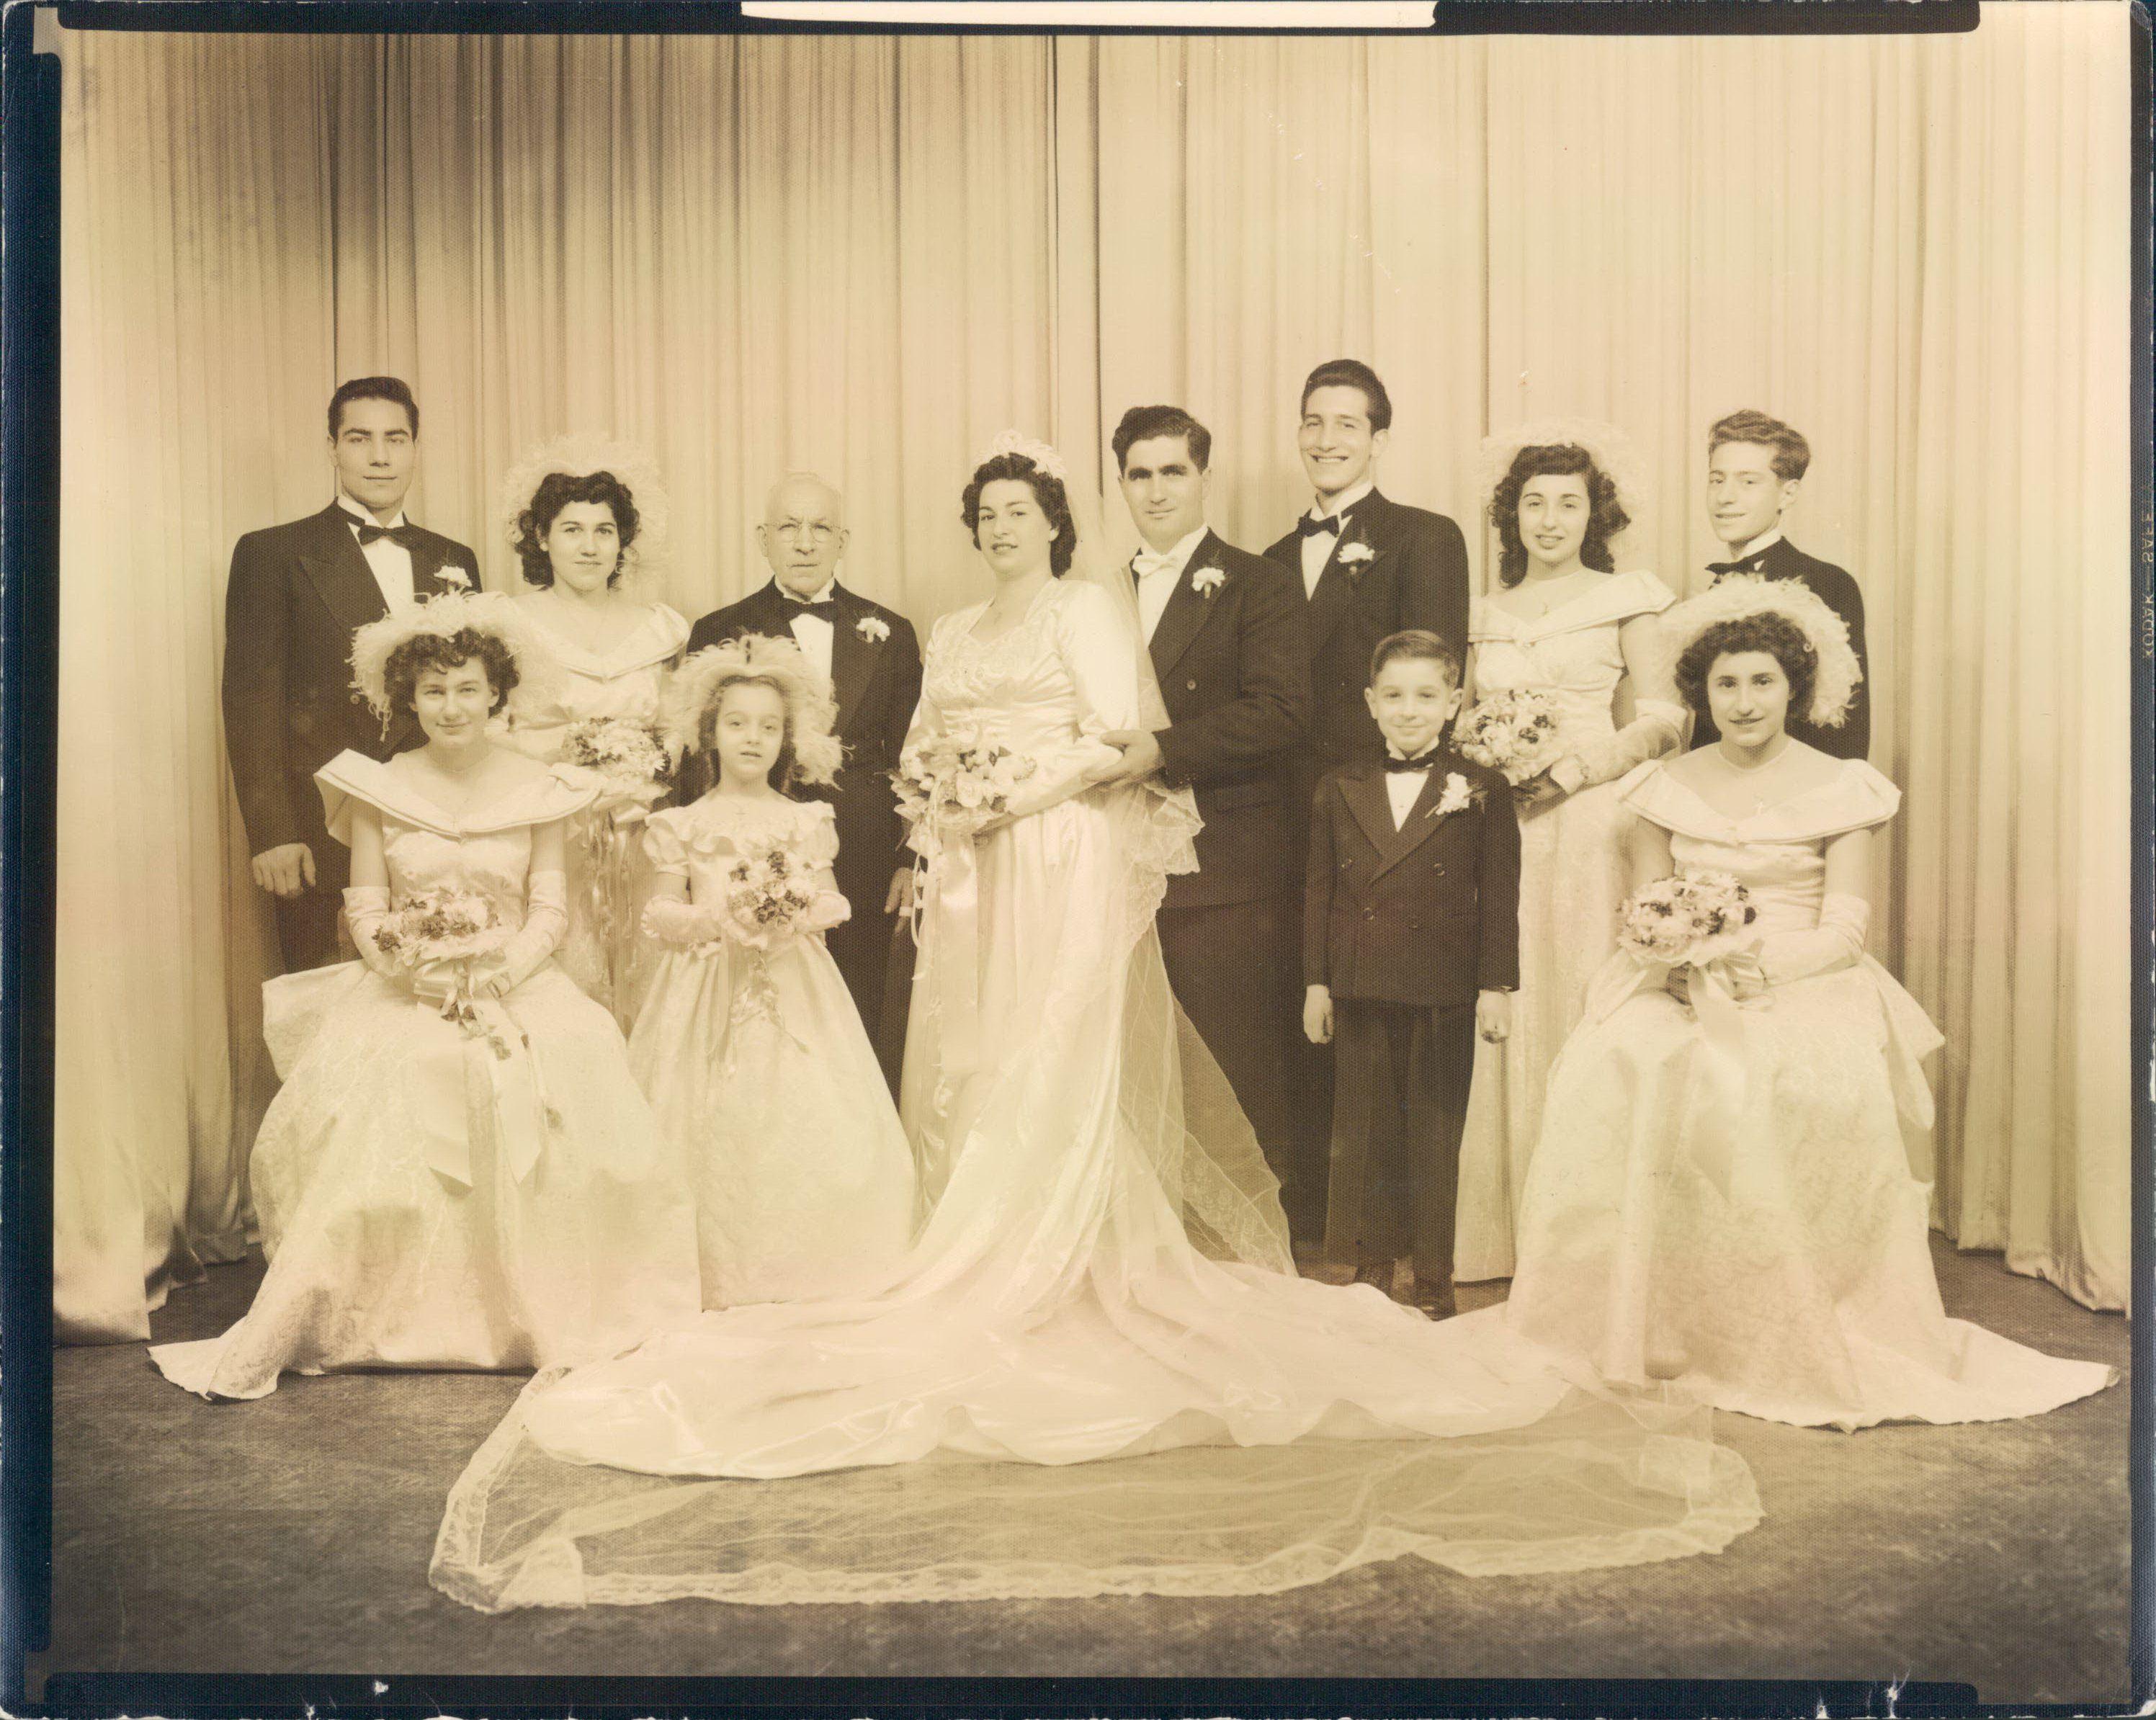 My Grandparents Wedding 1940s New Jersey 1st Generation